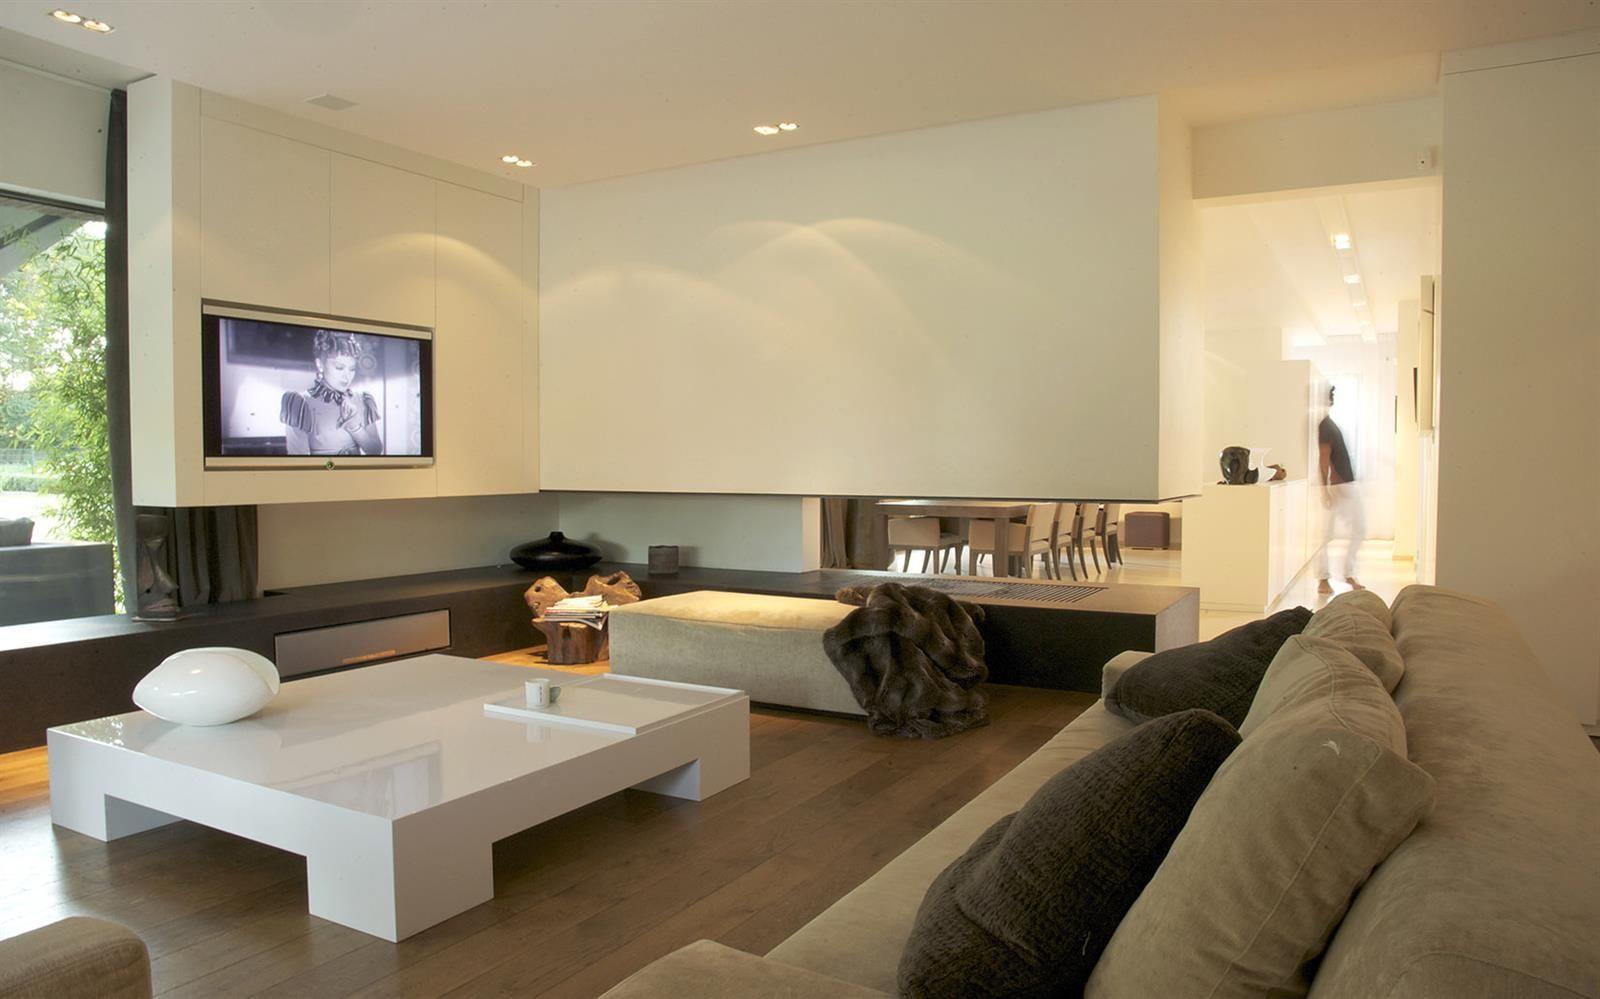 Grand Salon Contemporain Living Room Pinterest Grand Salon - Idee deco grand salon